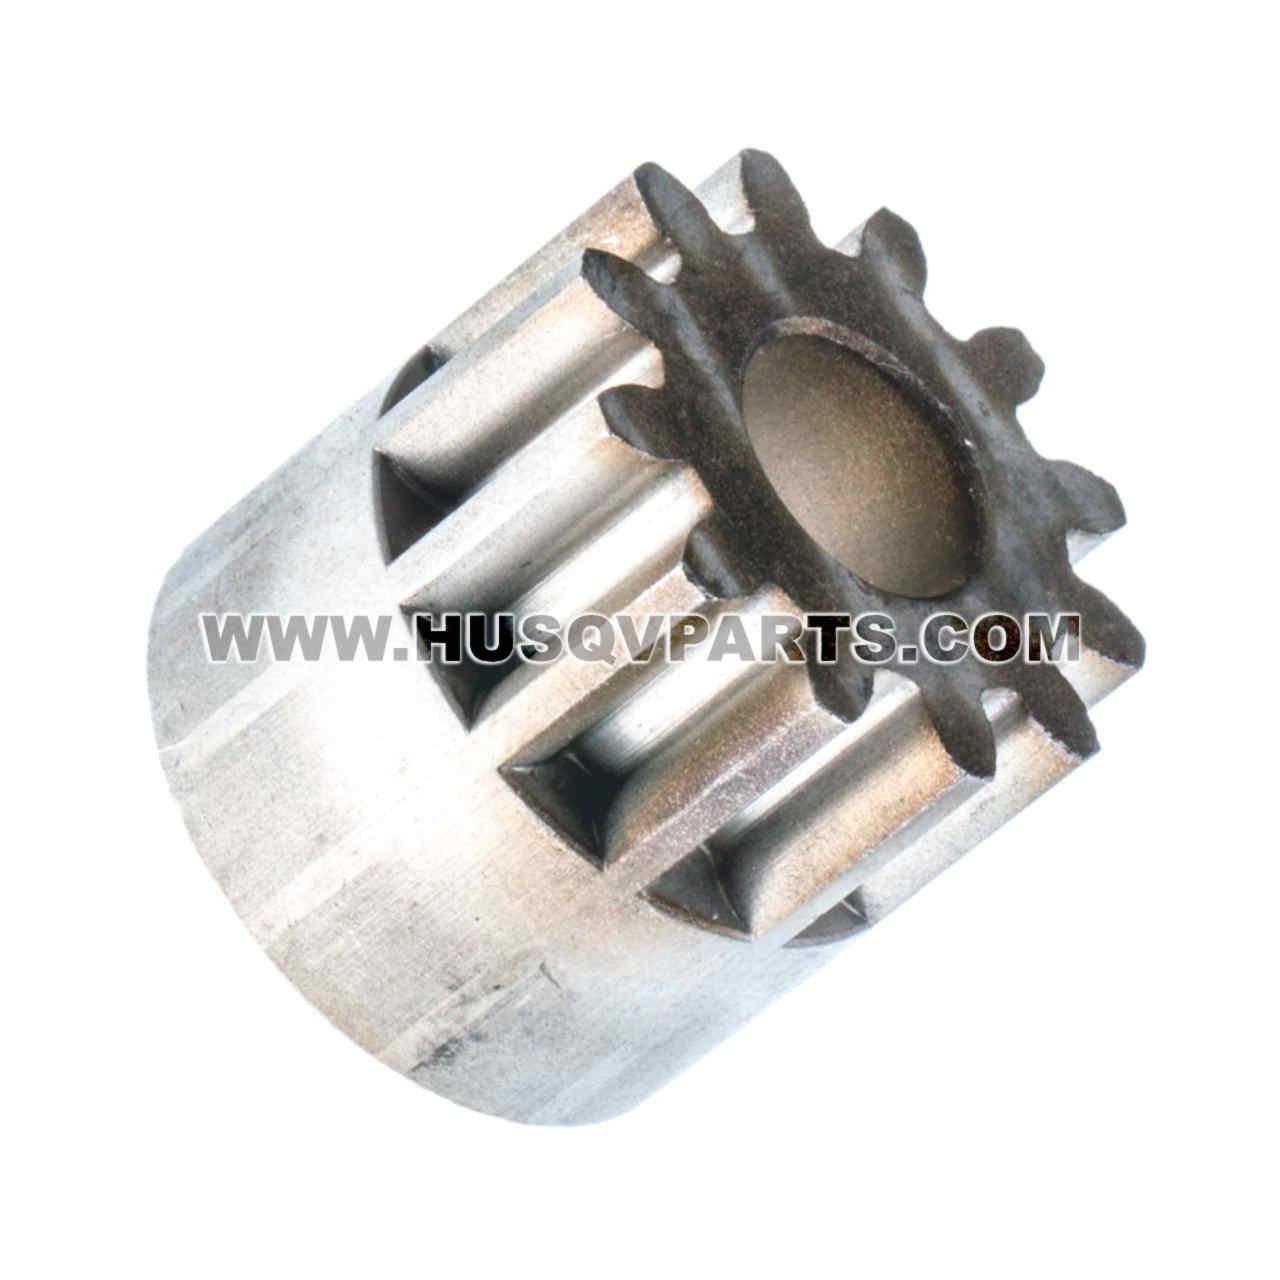 HUSQVARNA Gear ** 371906201 Image 1